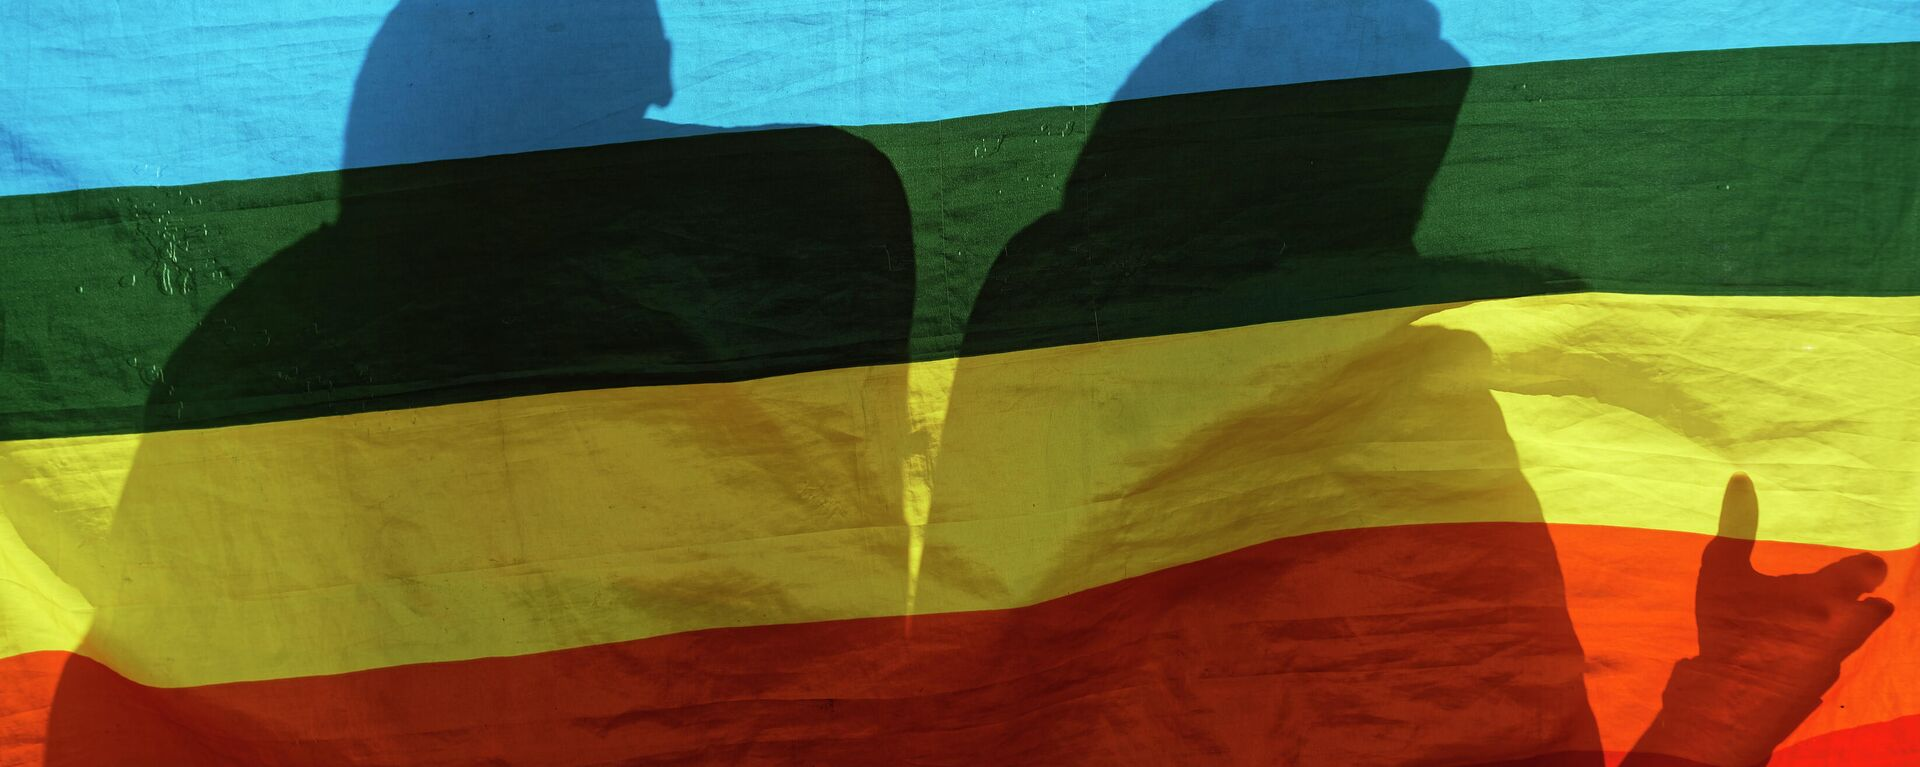 LGBT-Flagge - SNA, 1920, 05.02.2021